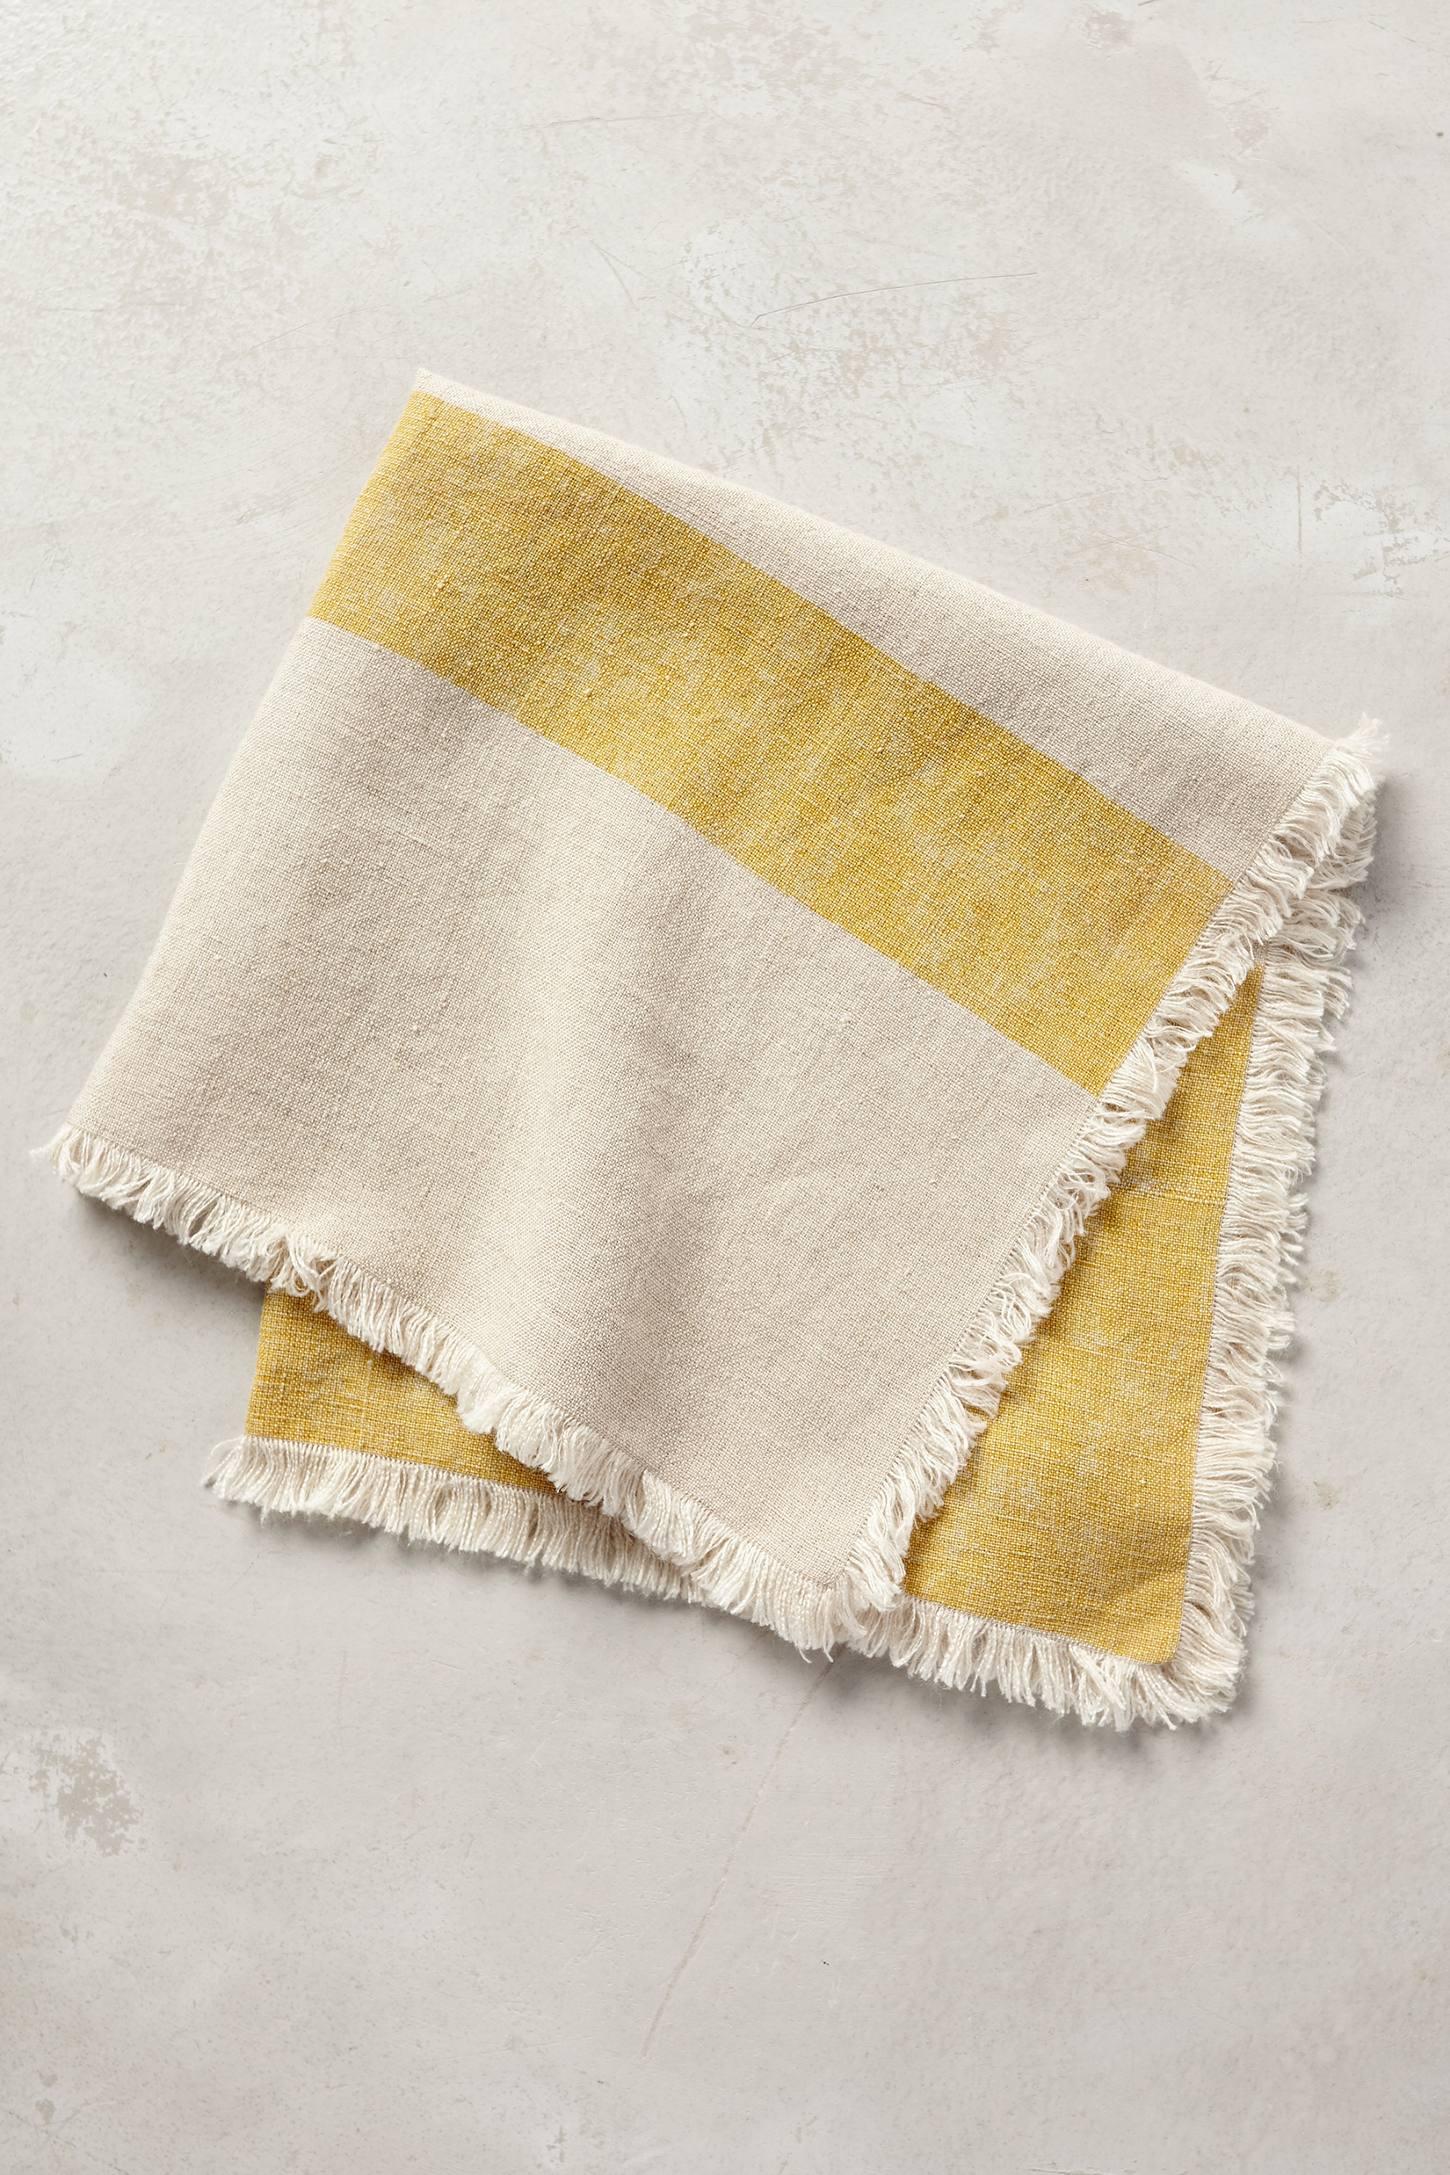 Linen Market Napkin